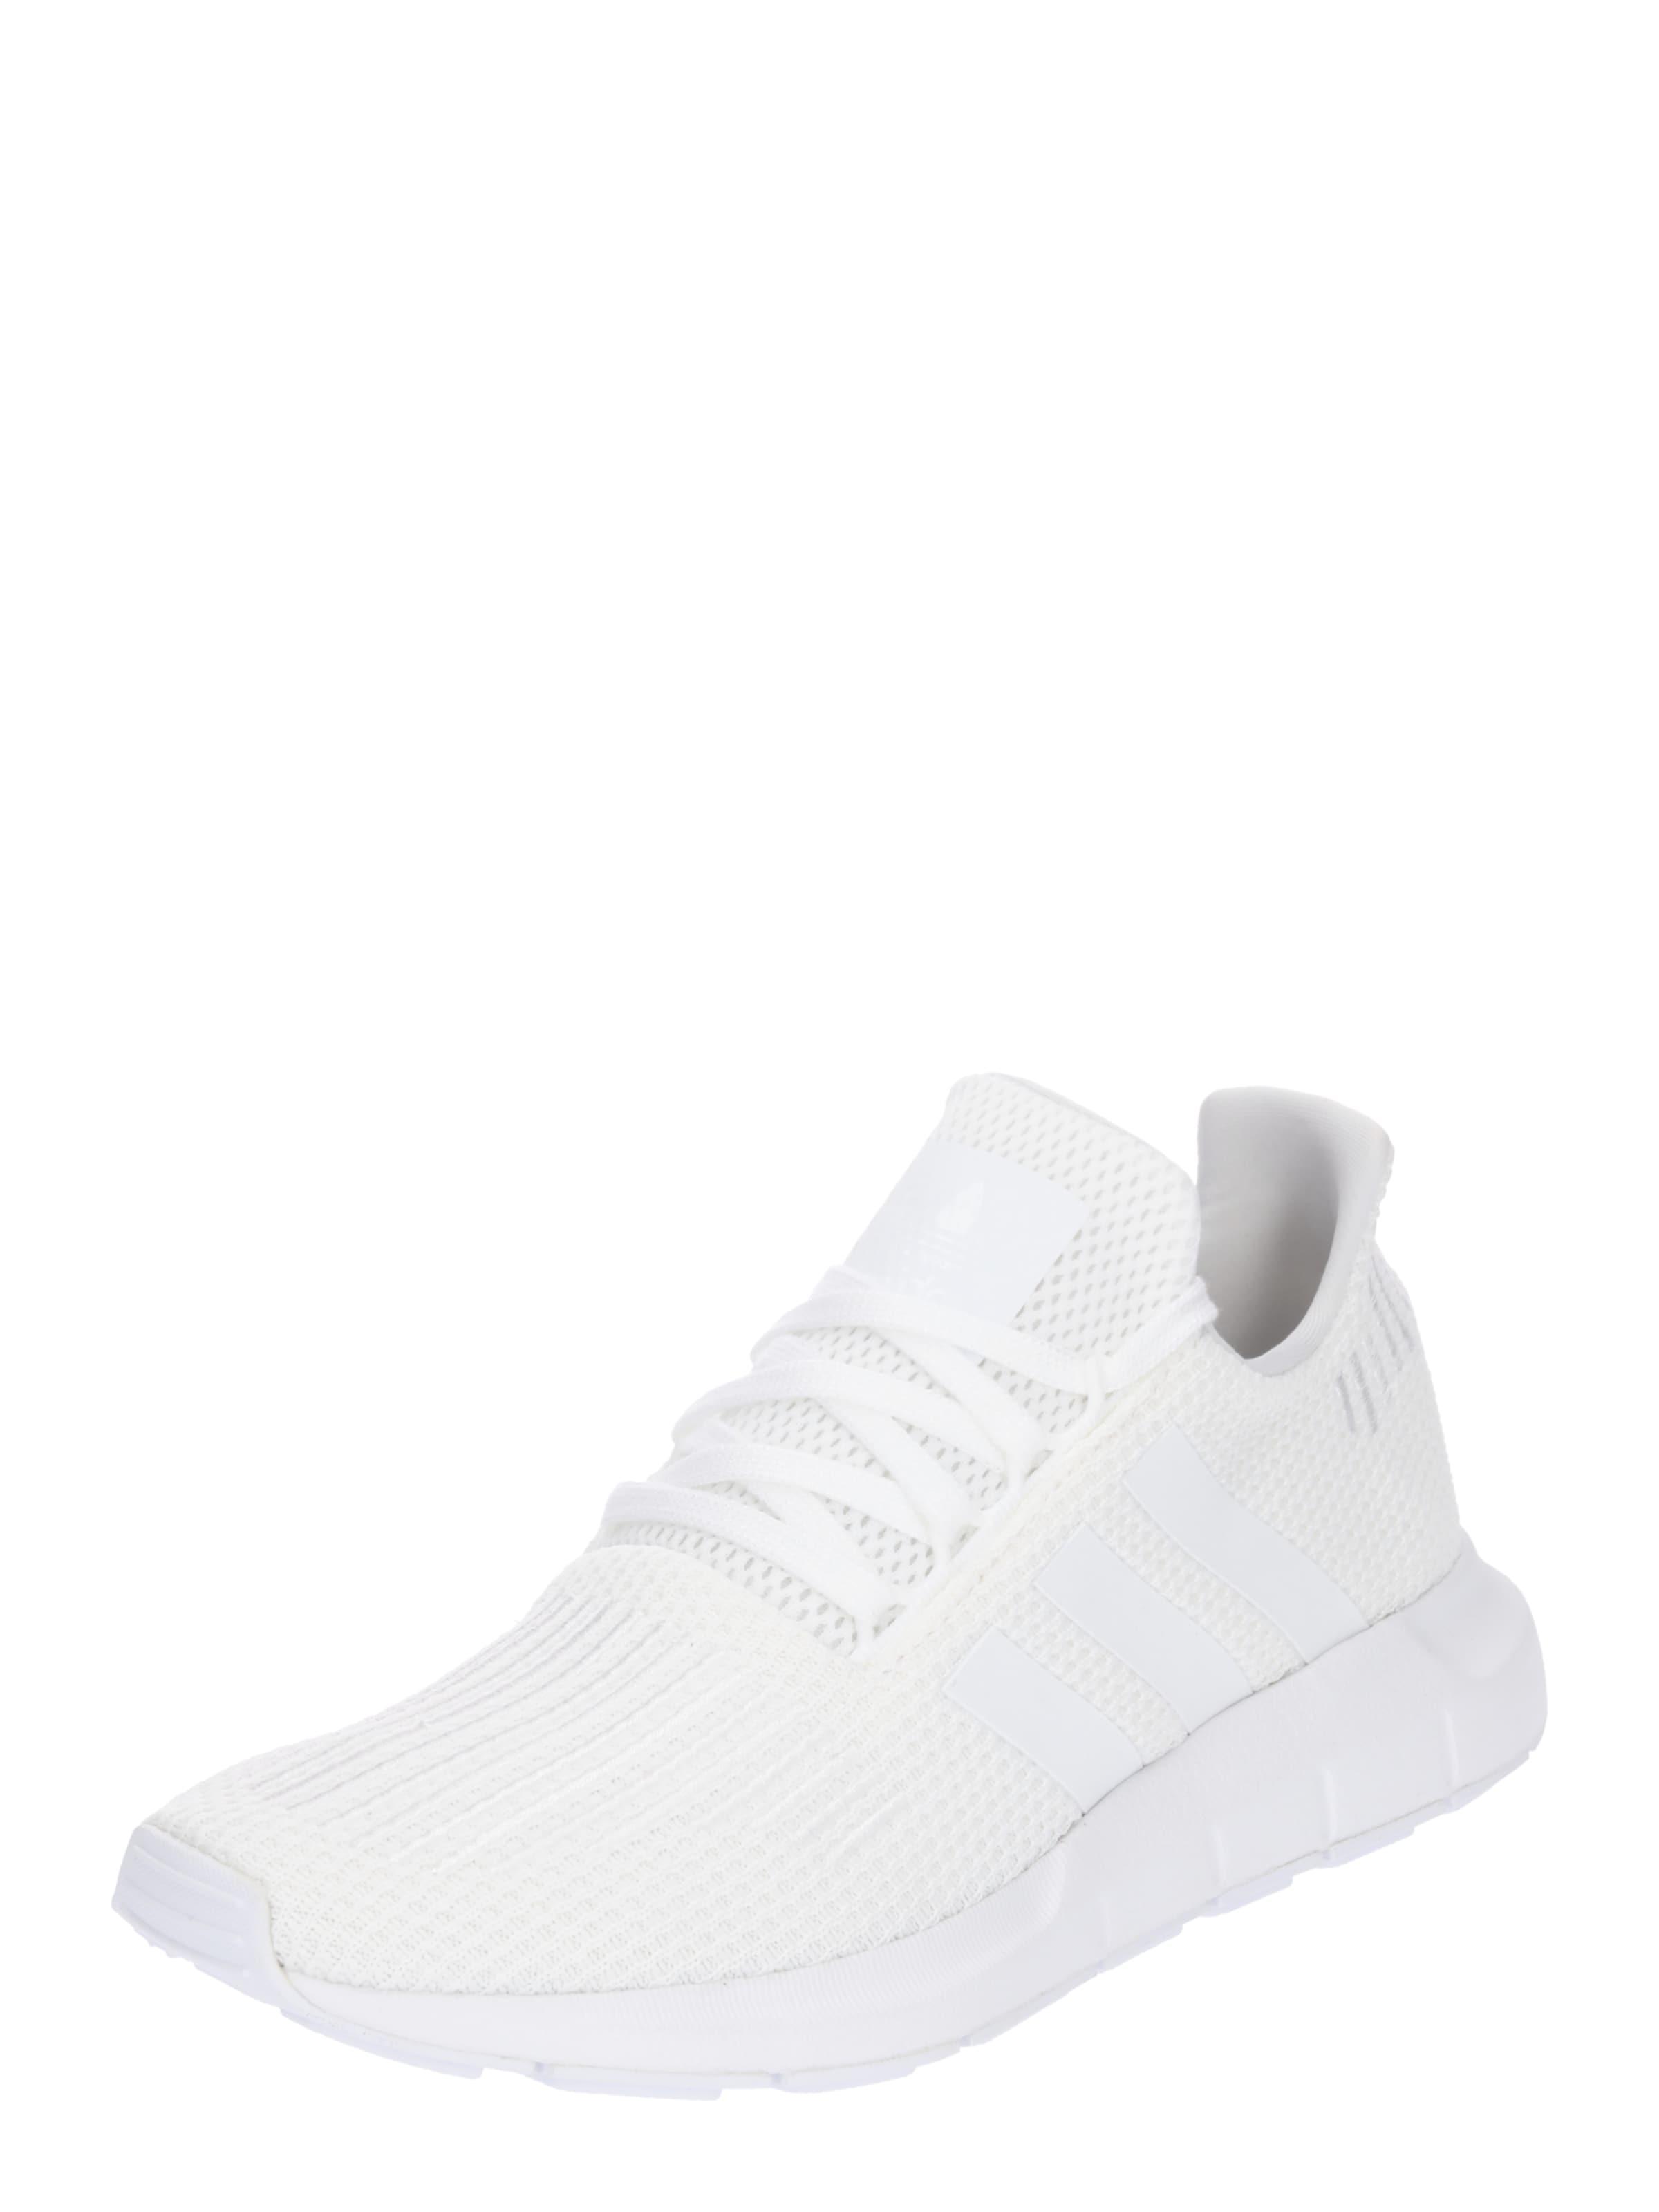 ADIDAS ORIGINALS Sneaker Low  Swift Run